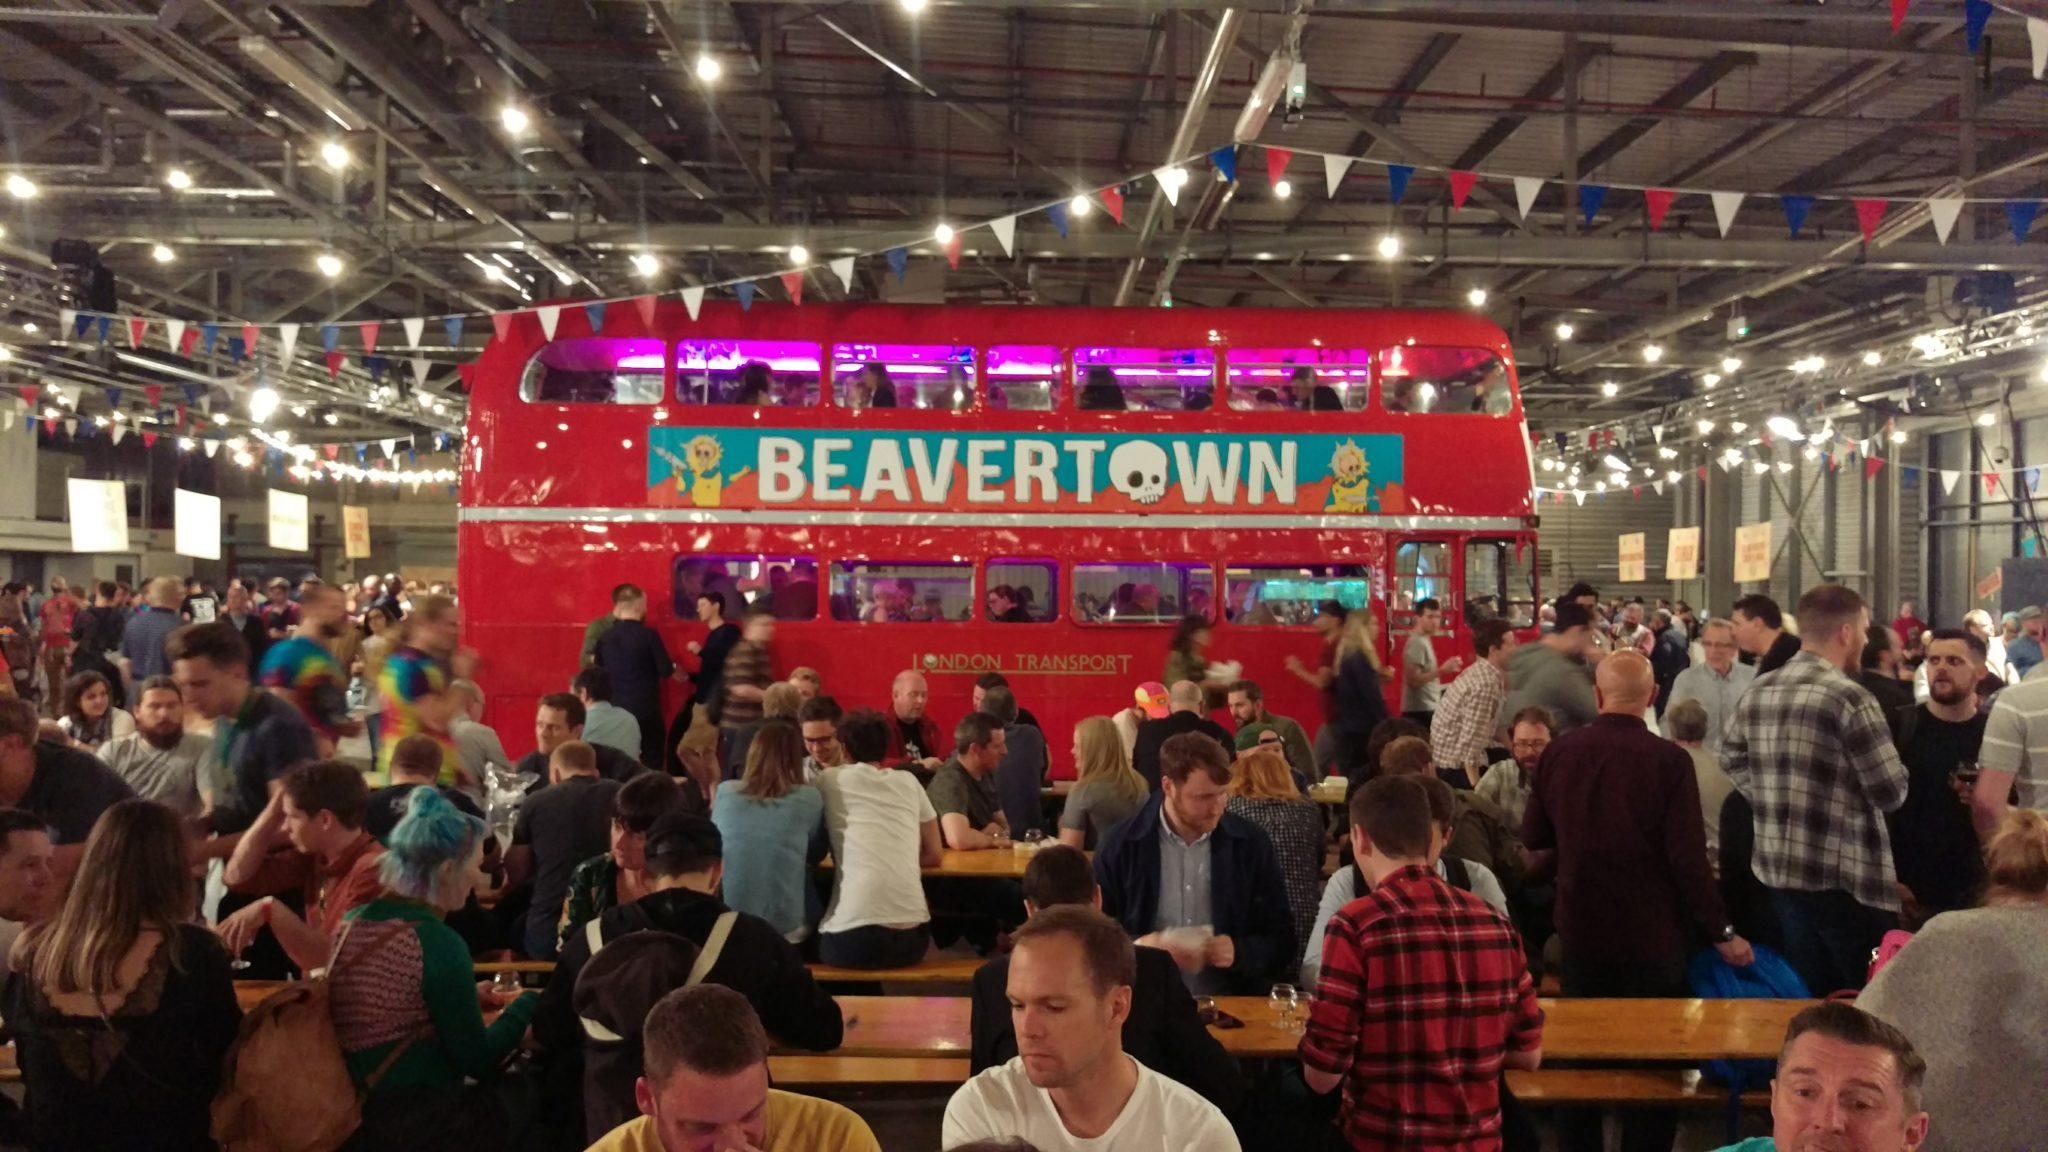 The Beavertown Extravaganza